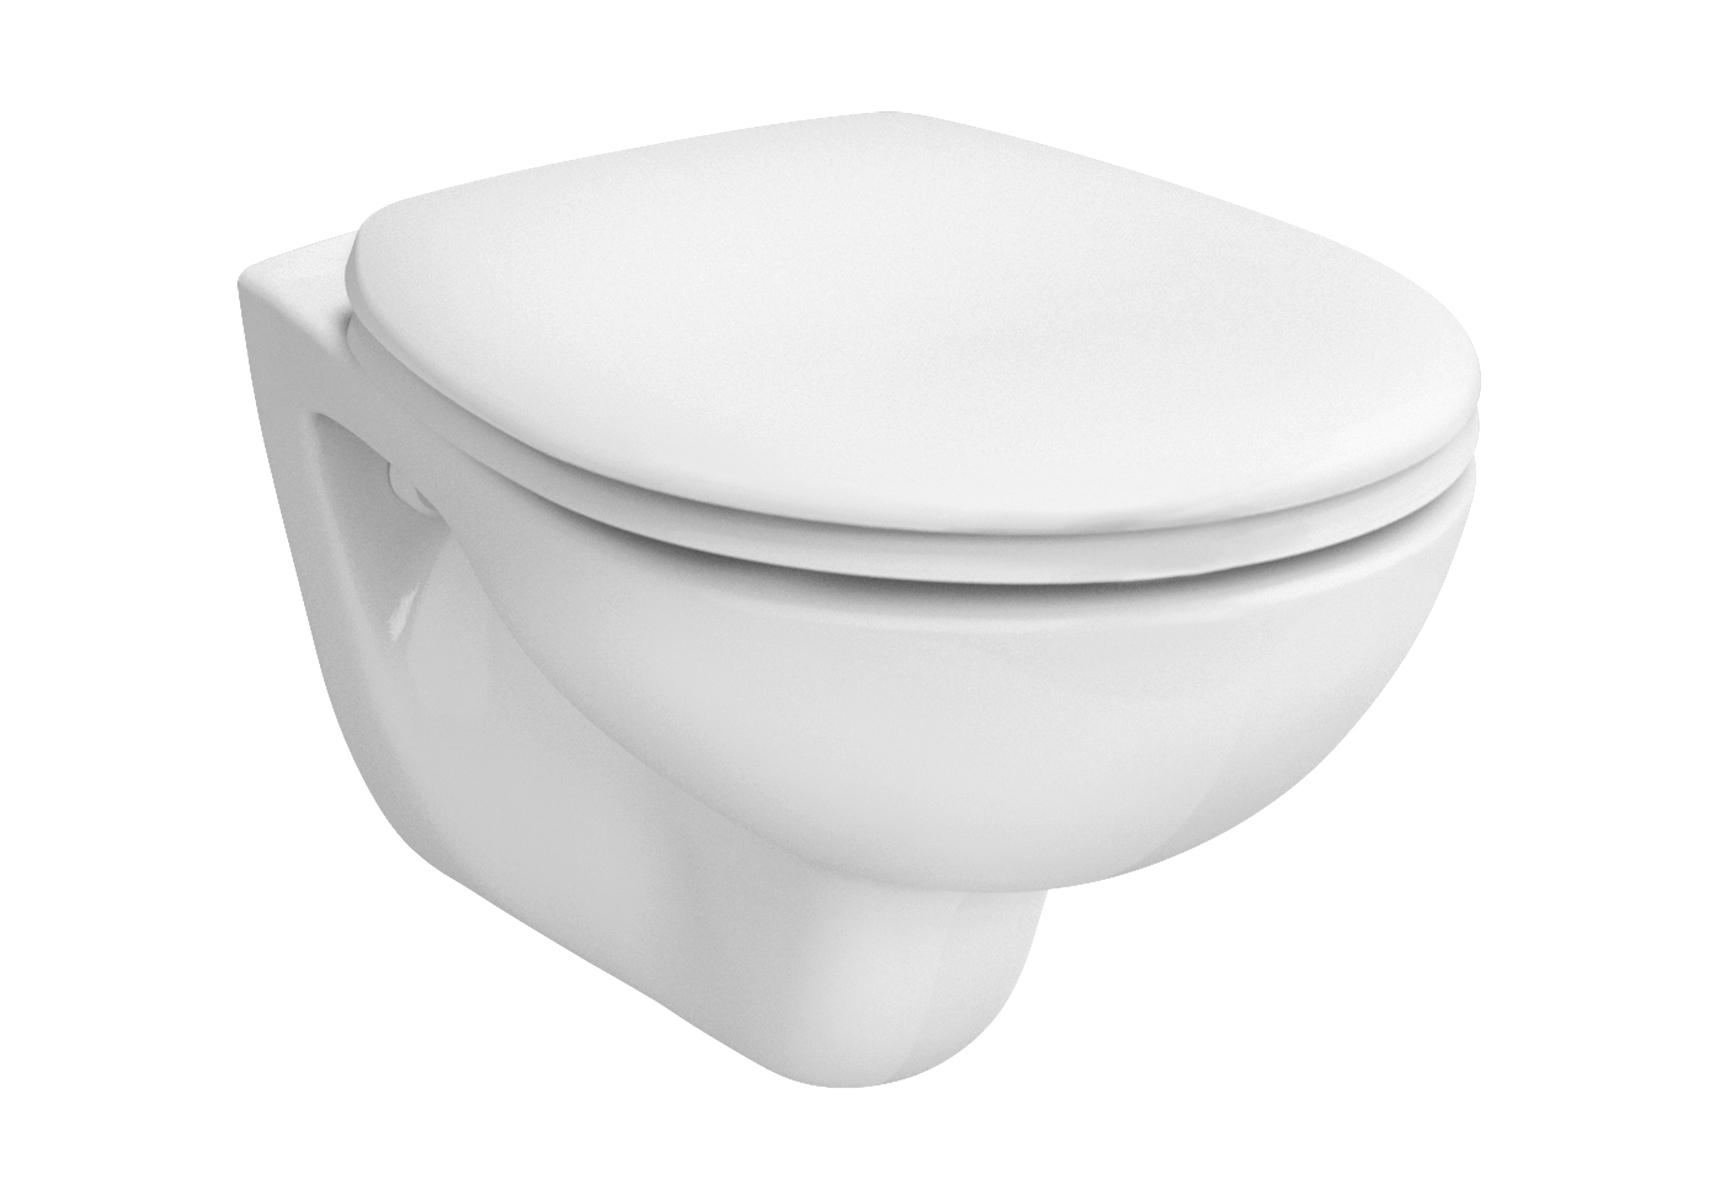 Arkitekt WC suspendu avec bride compact, 51,5 cm